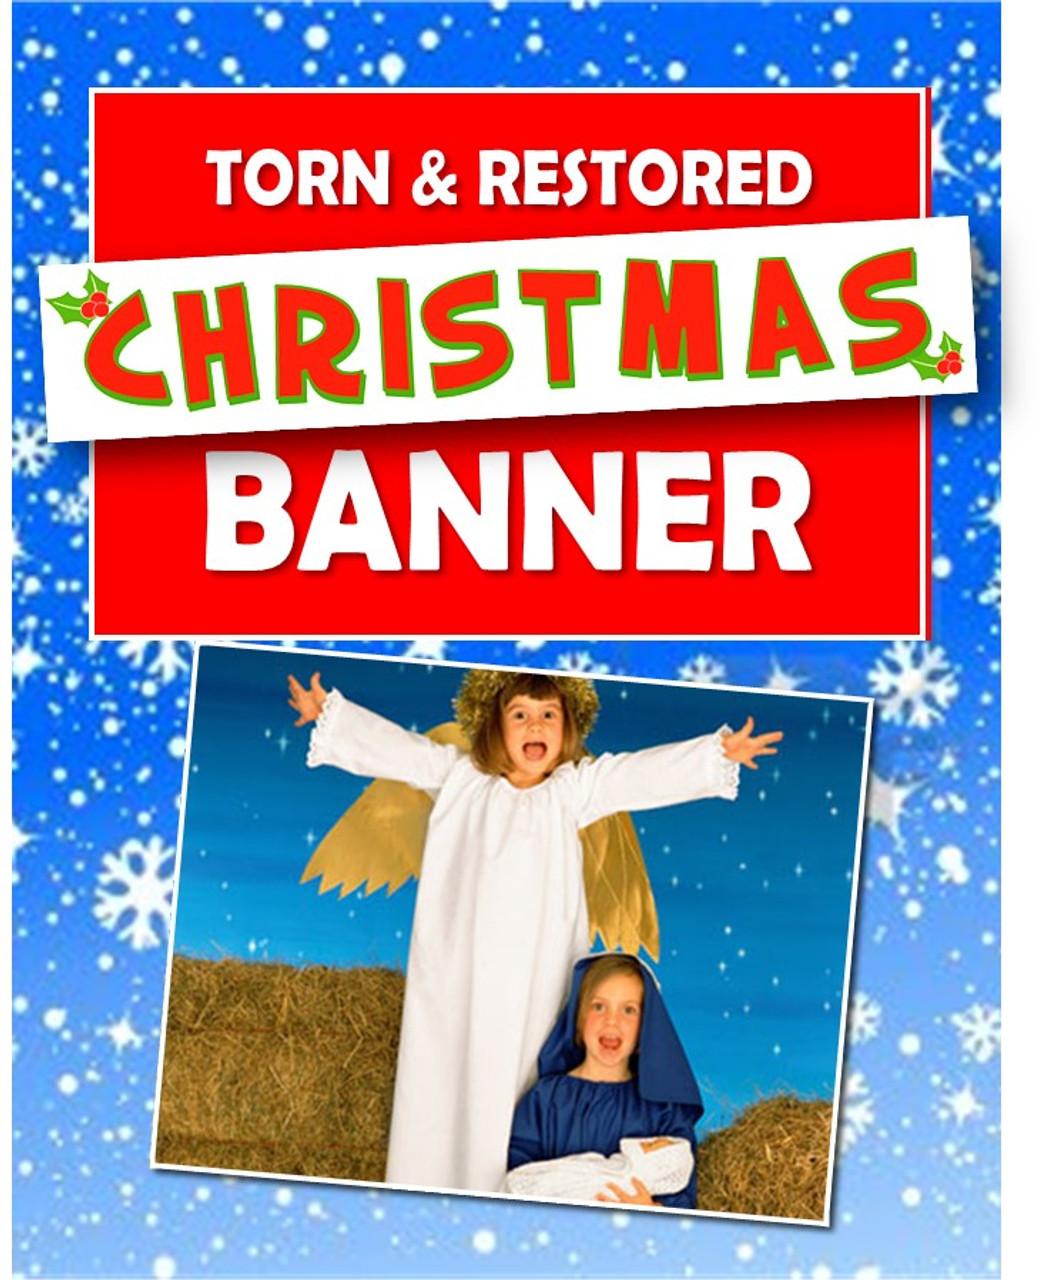 Torn & Restored Christmas Banner Gospel Magic Trick